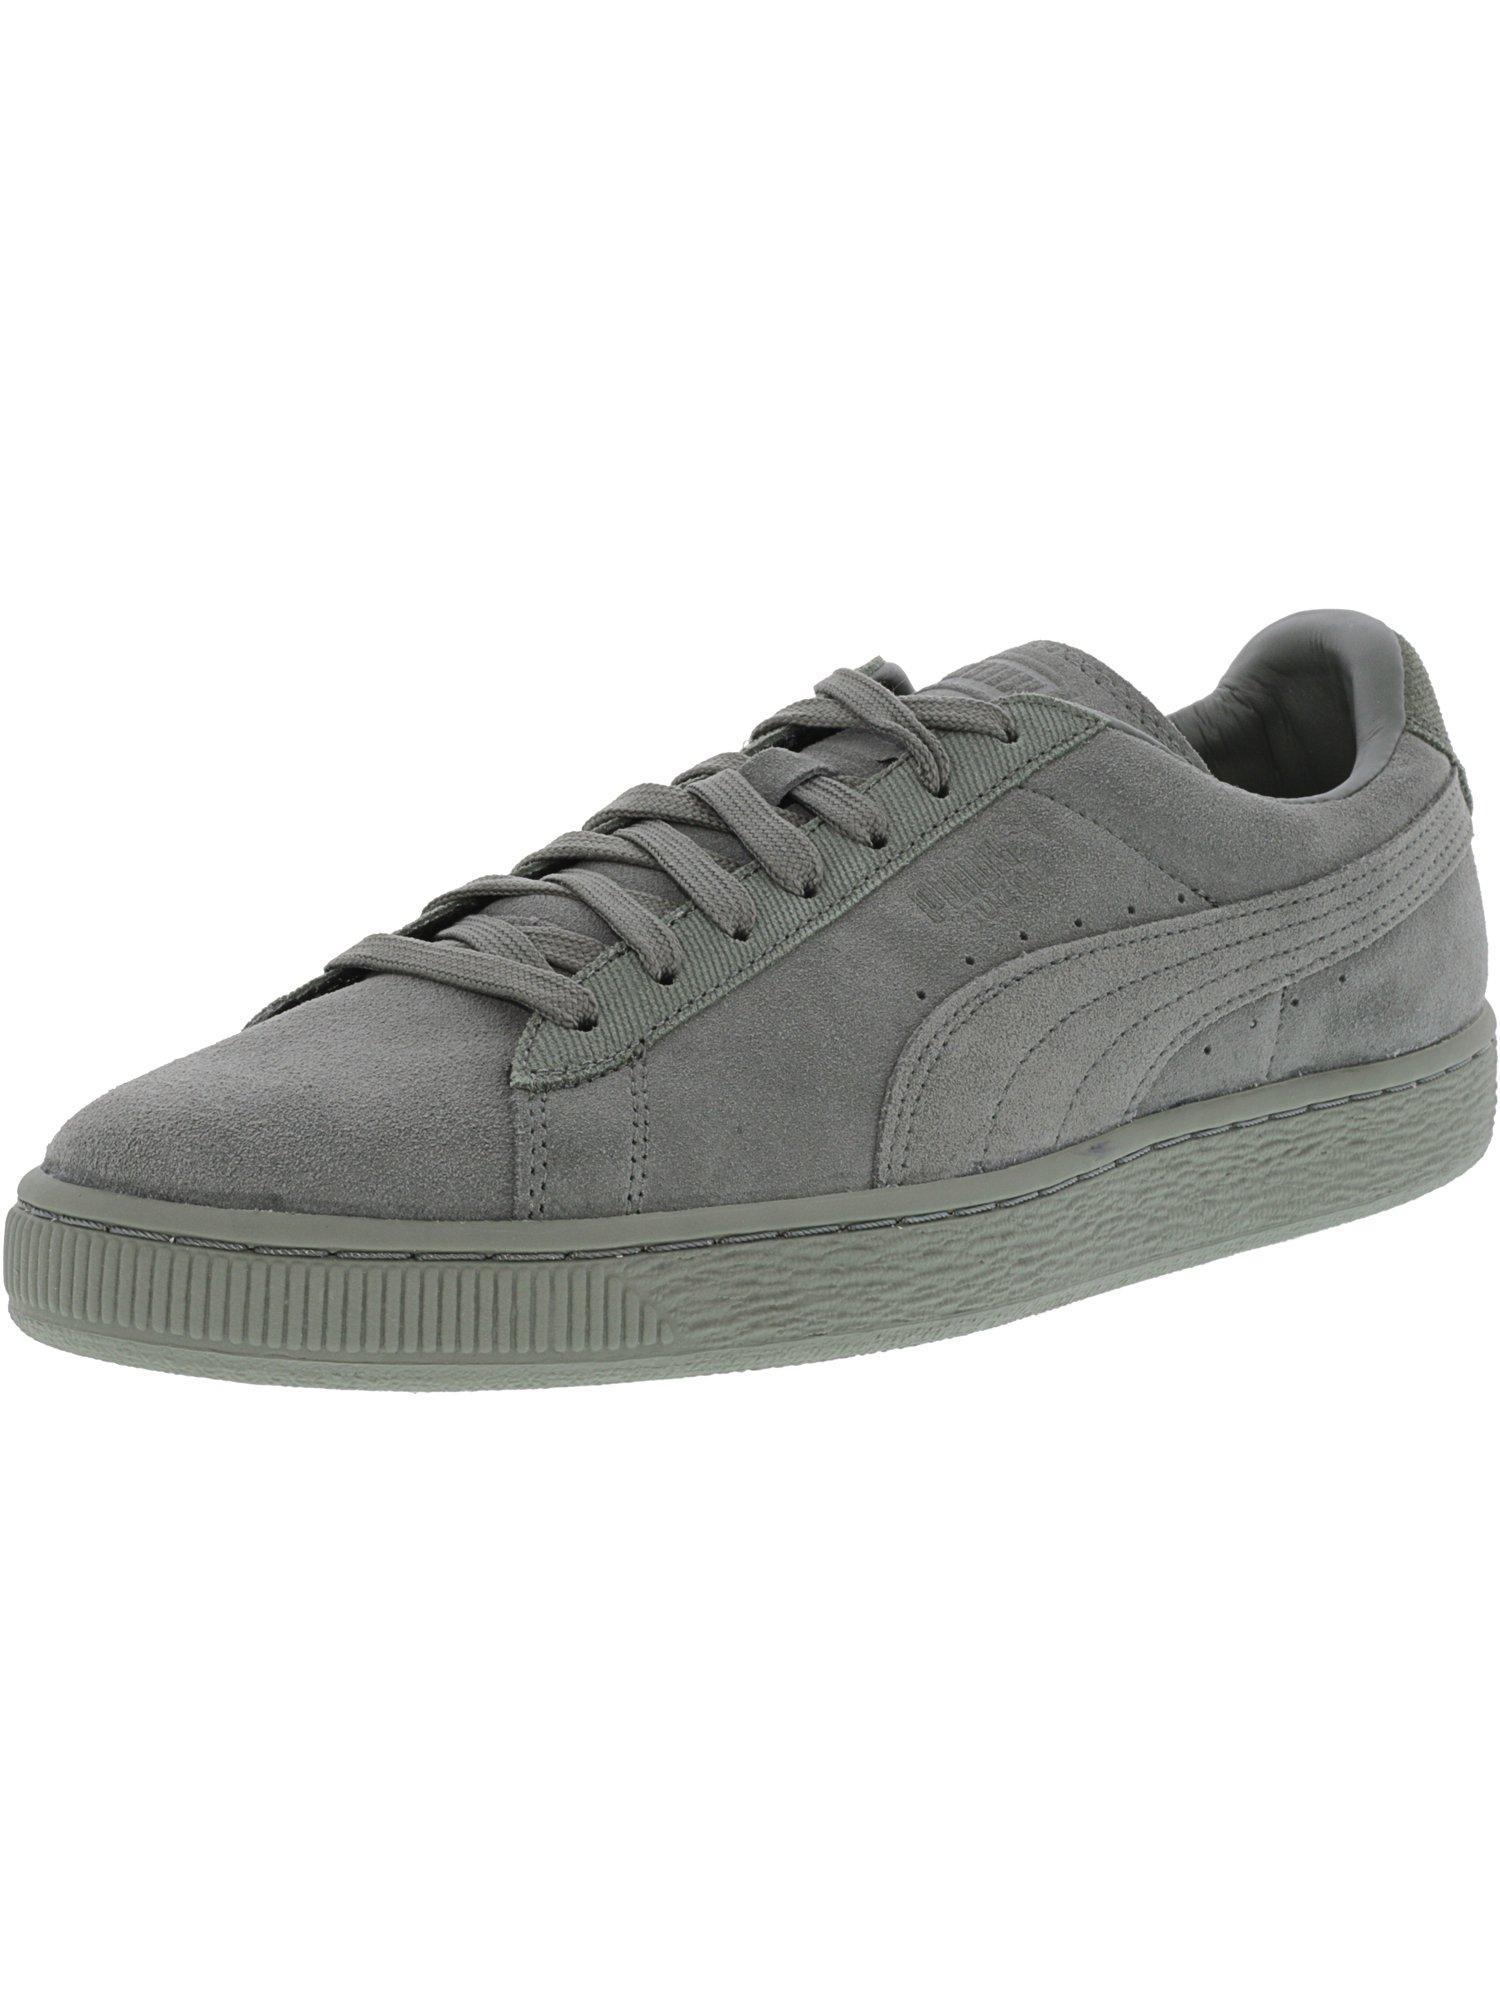 Puma Men's Suede Classic Tonal Natural Vachetta Ankle-High Fashion Sneaker - 8M